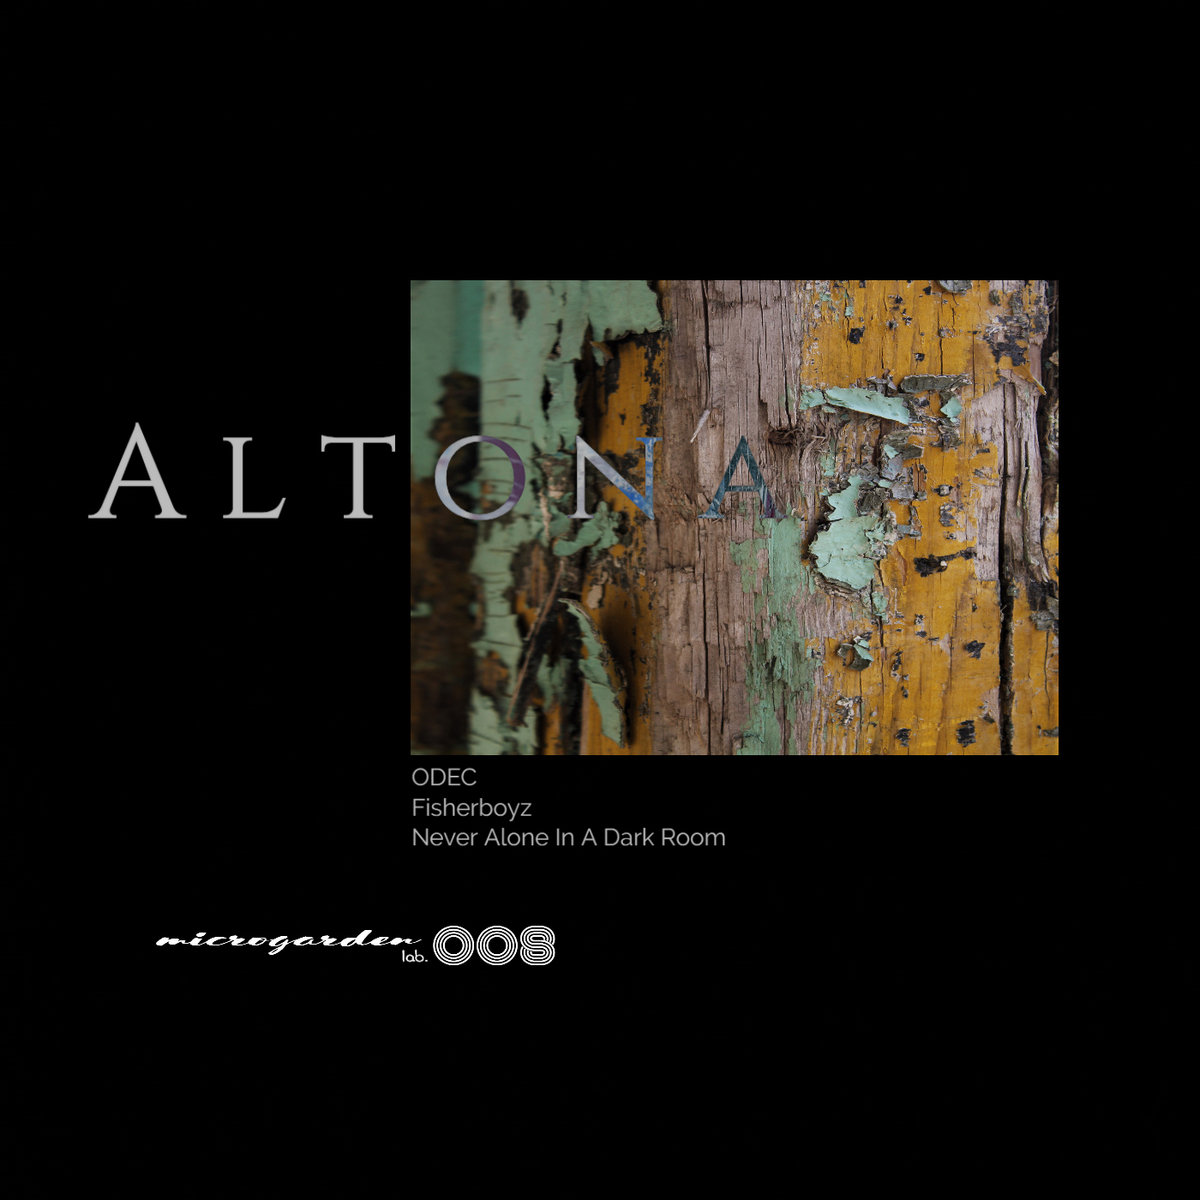 ODEC - Altona EP incl. Fisherboyz and Never Alone In A Dark Room Remix [Microgarden lab.]